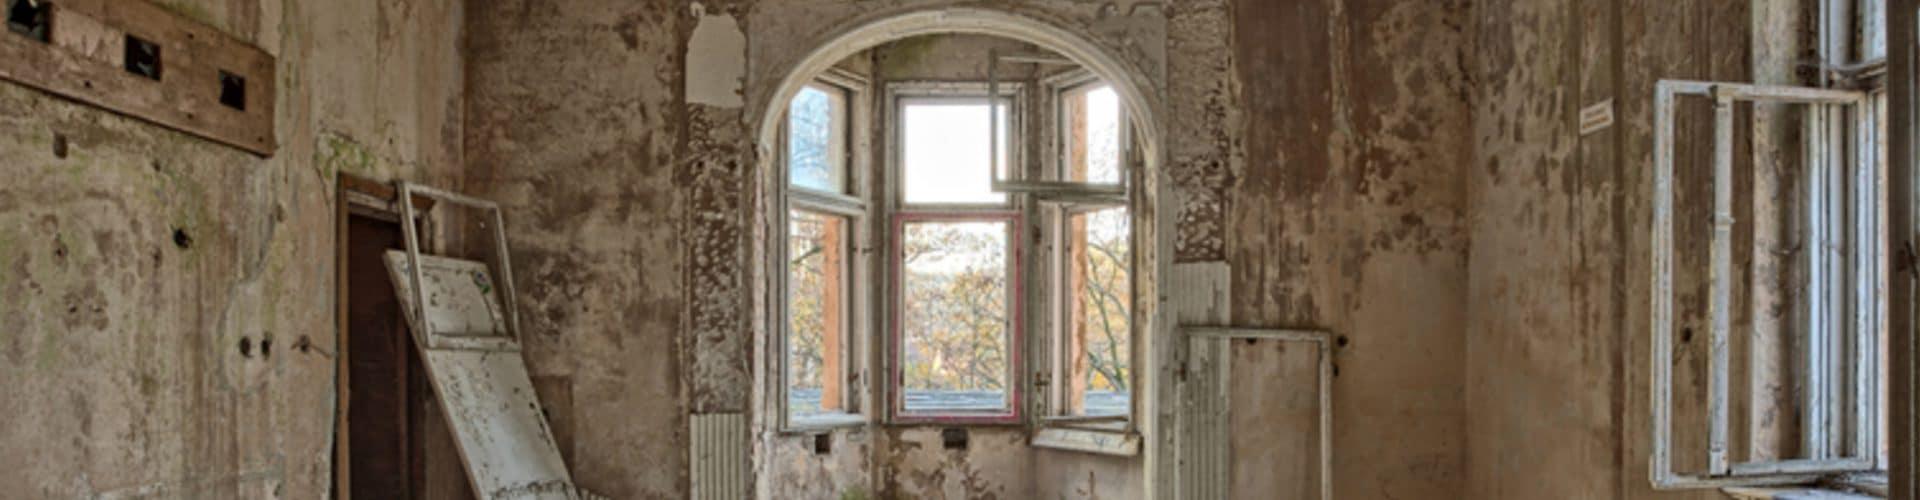 Beautiful abandoned house for demolition - Big Easy Demolition